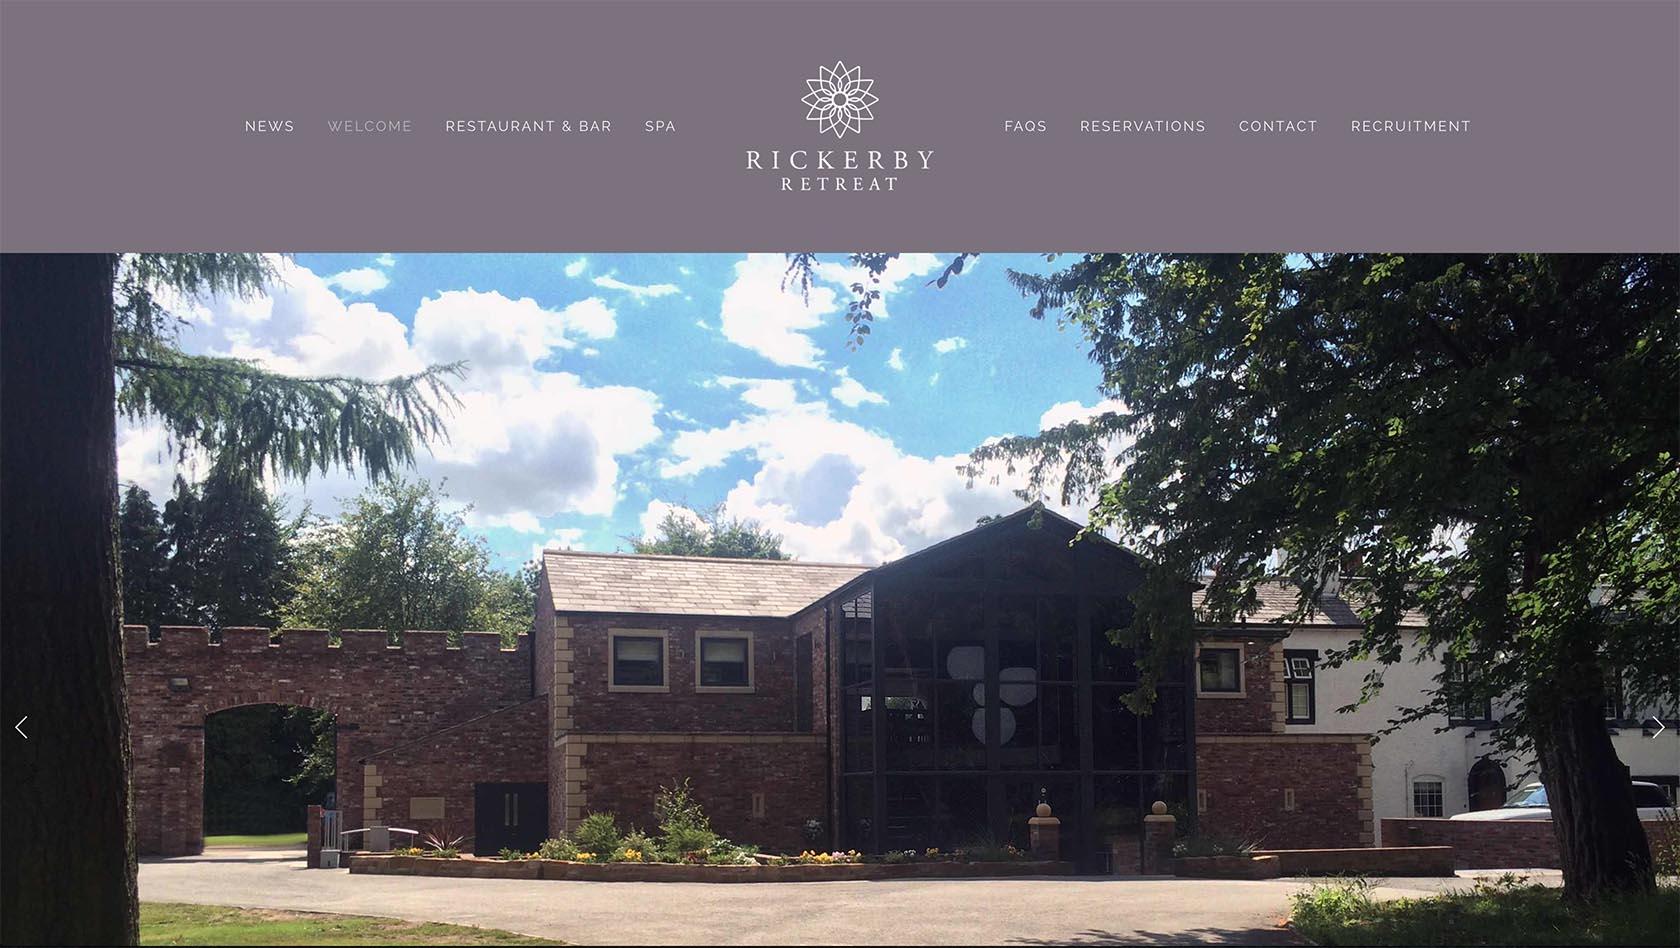 Rickerby Retreat